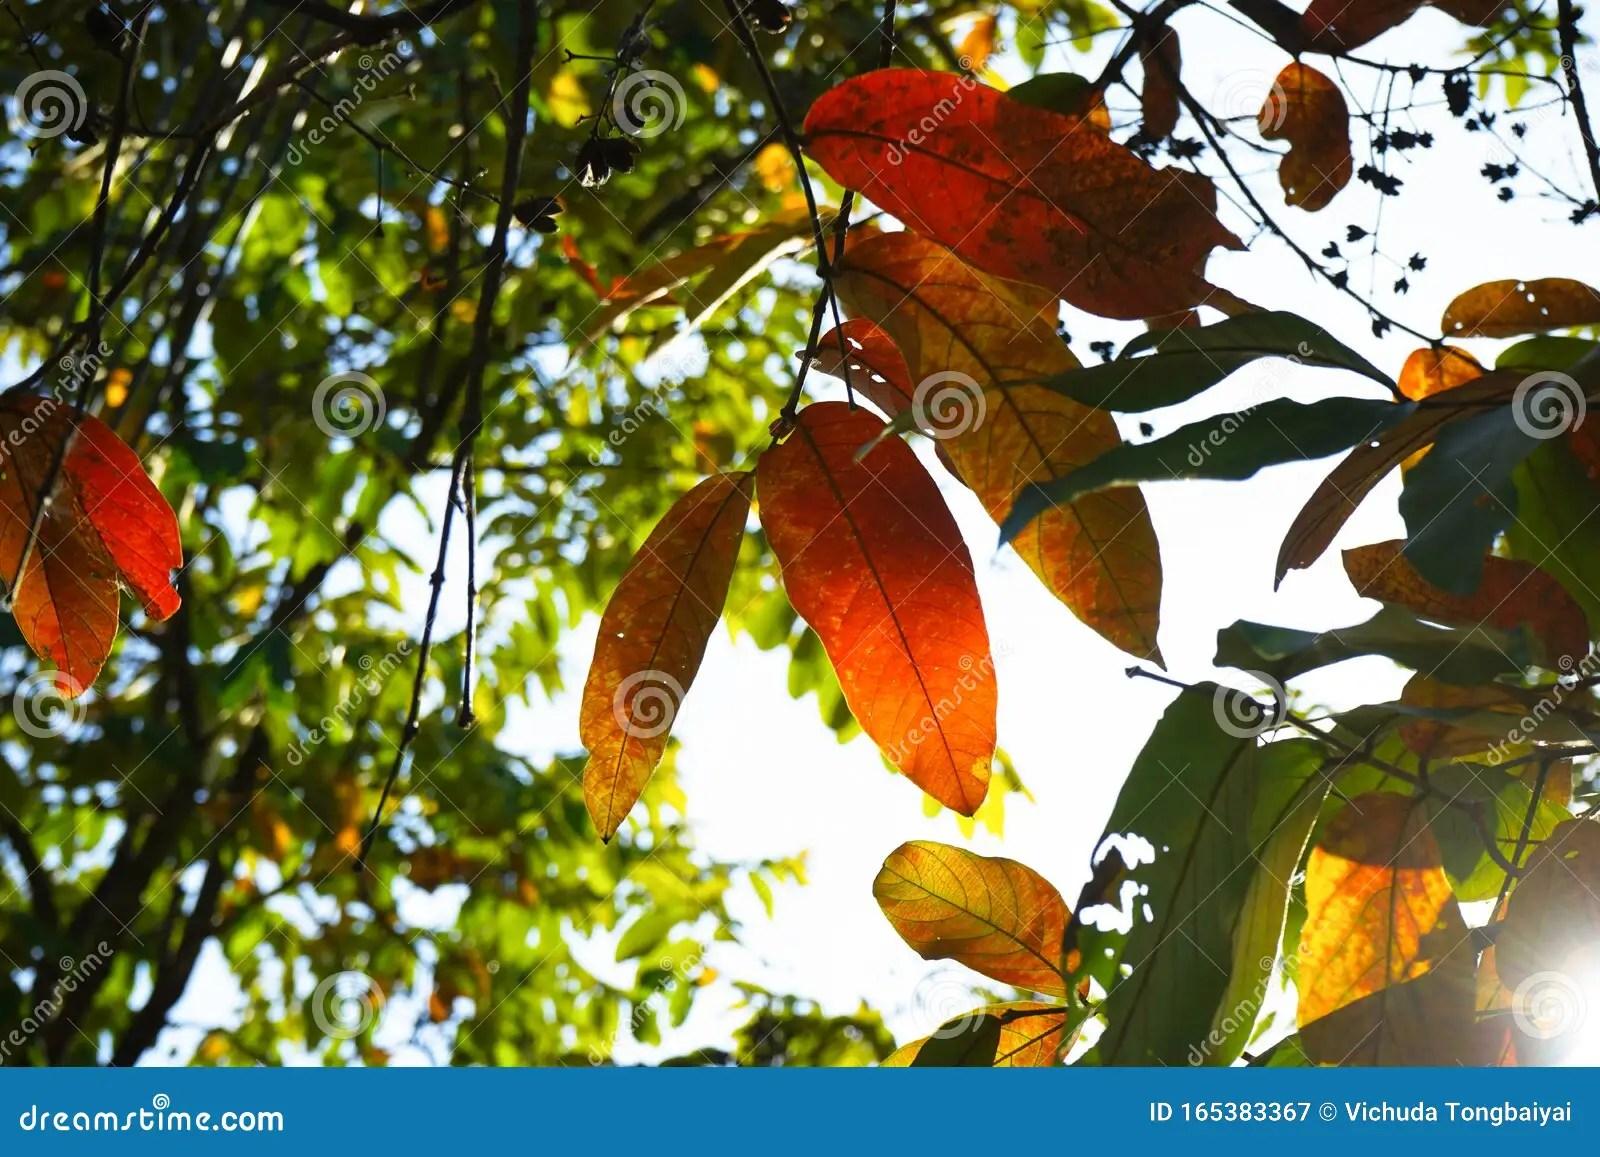 Colorful Leaves Season Change Beautiful Color On Tree